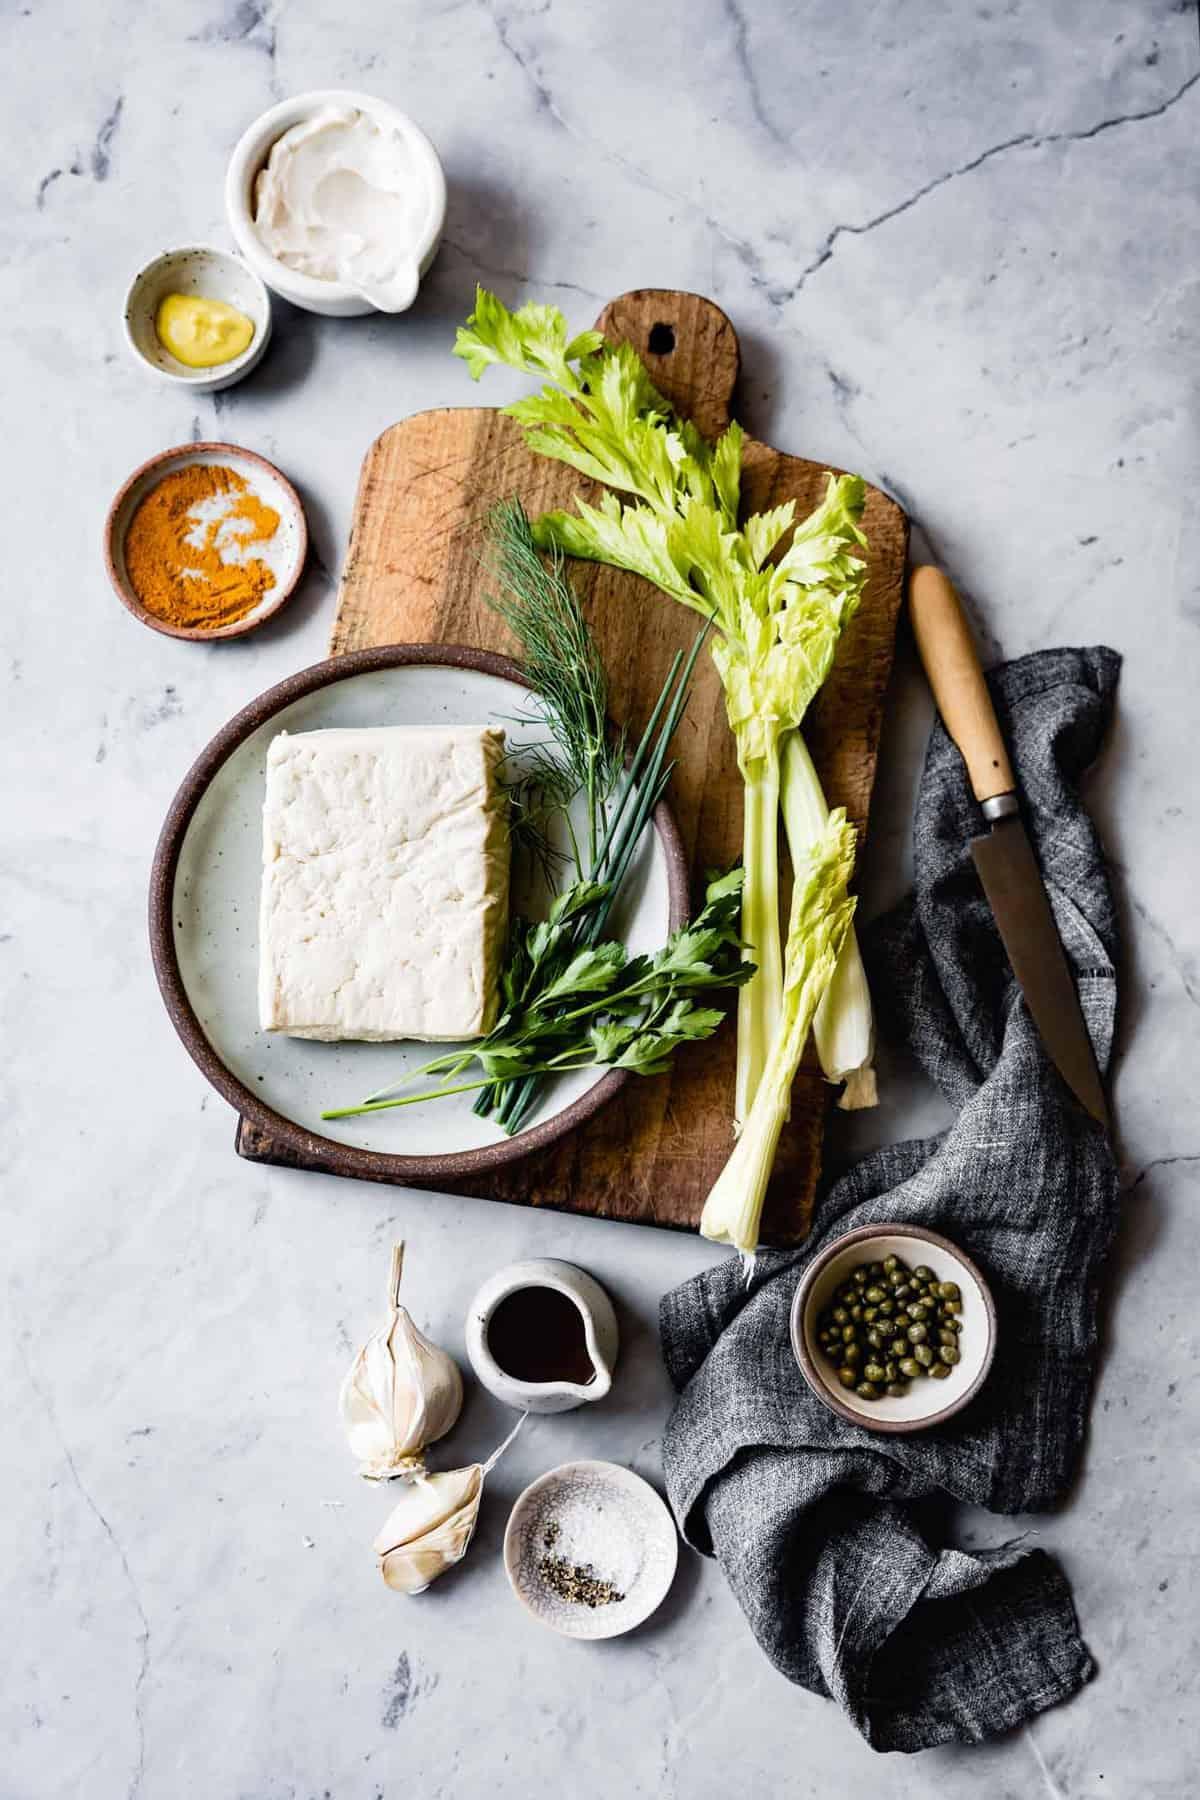 curried tofu salad ingredients on blue marble surface